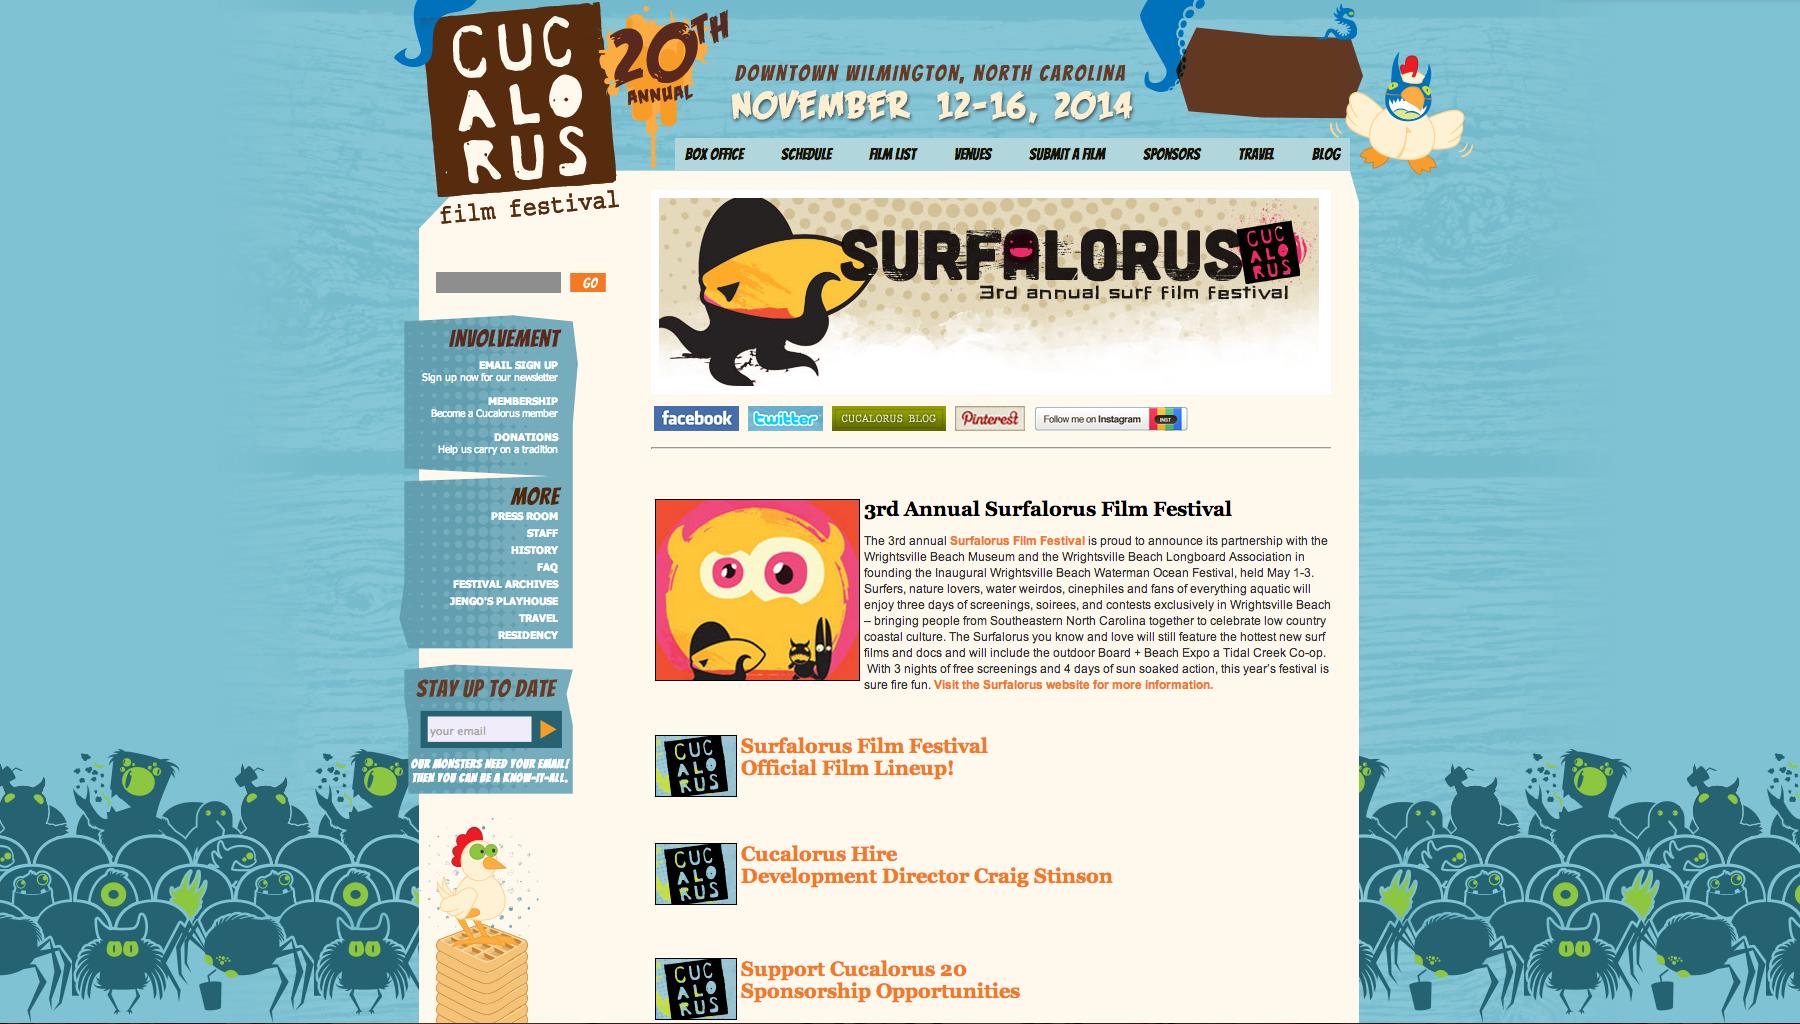 2014 Cucalorus Film Festival